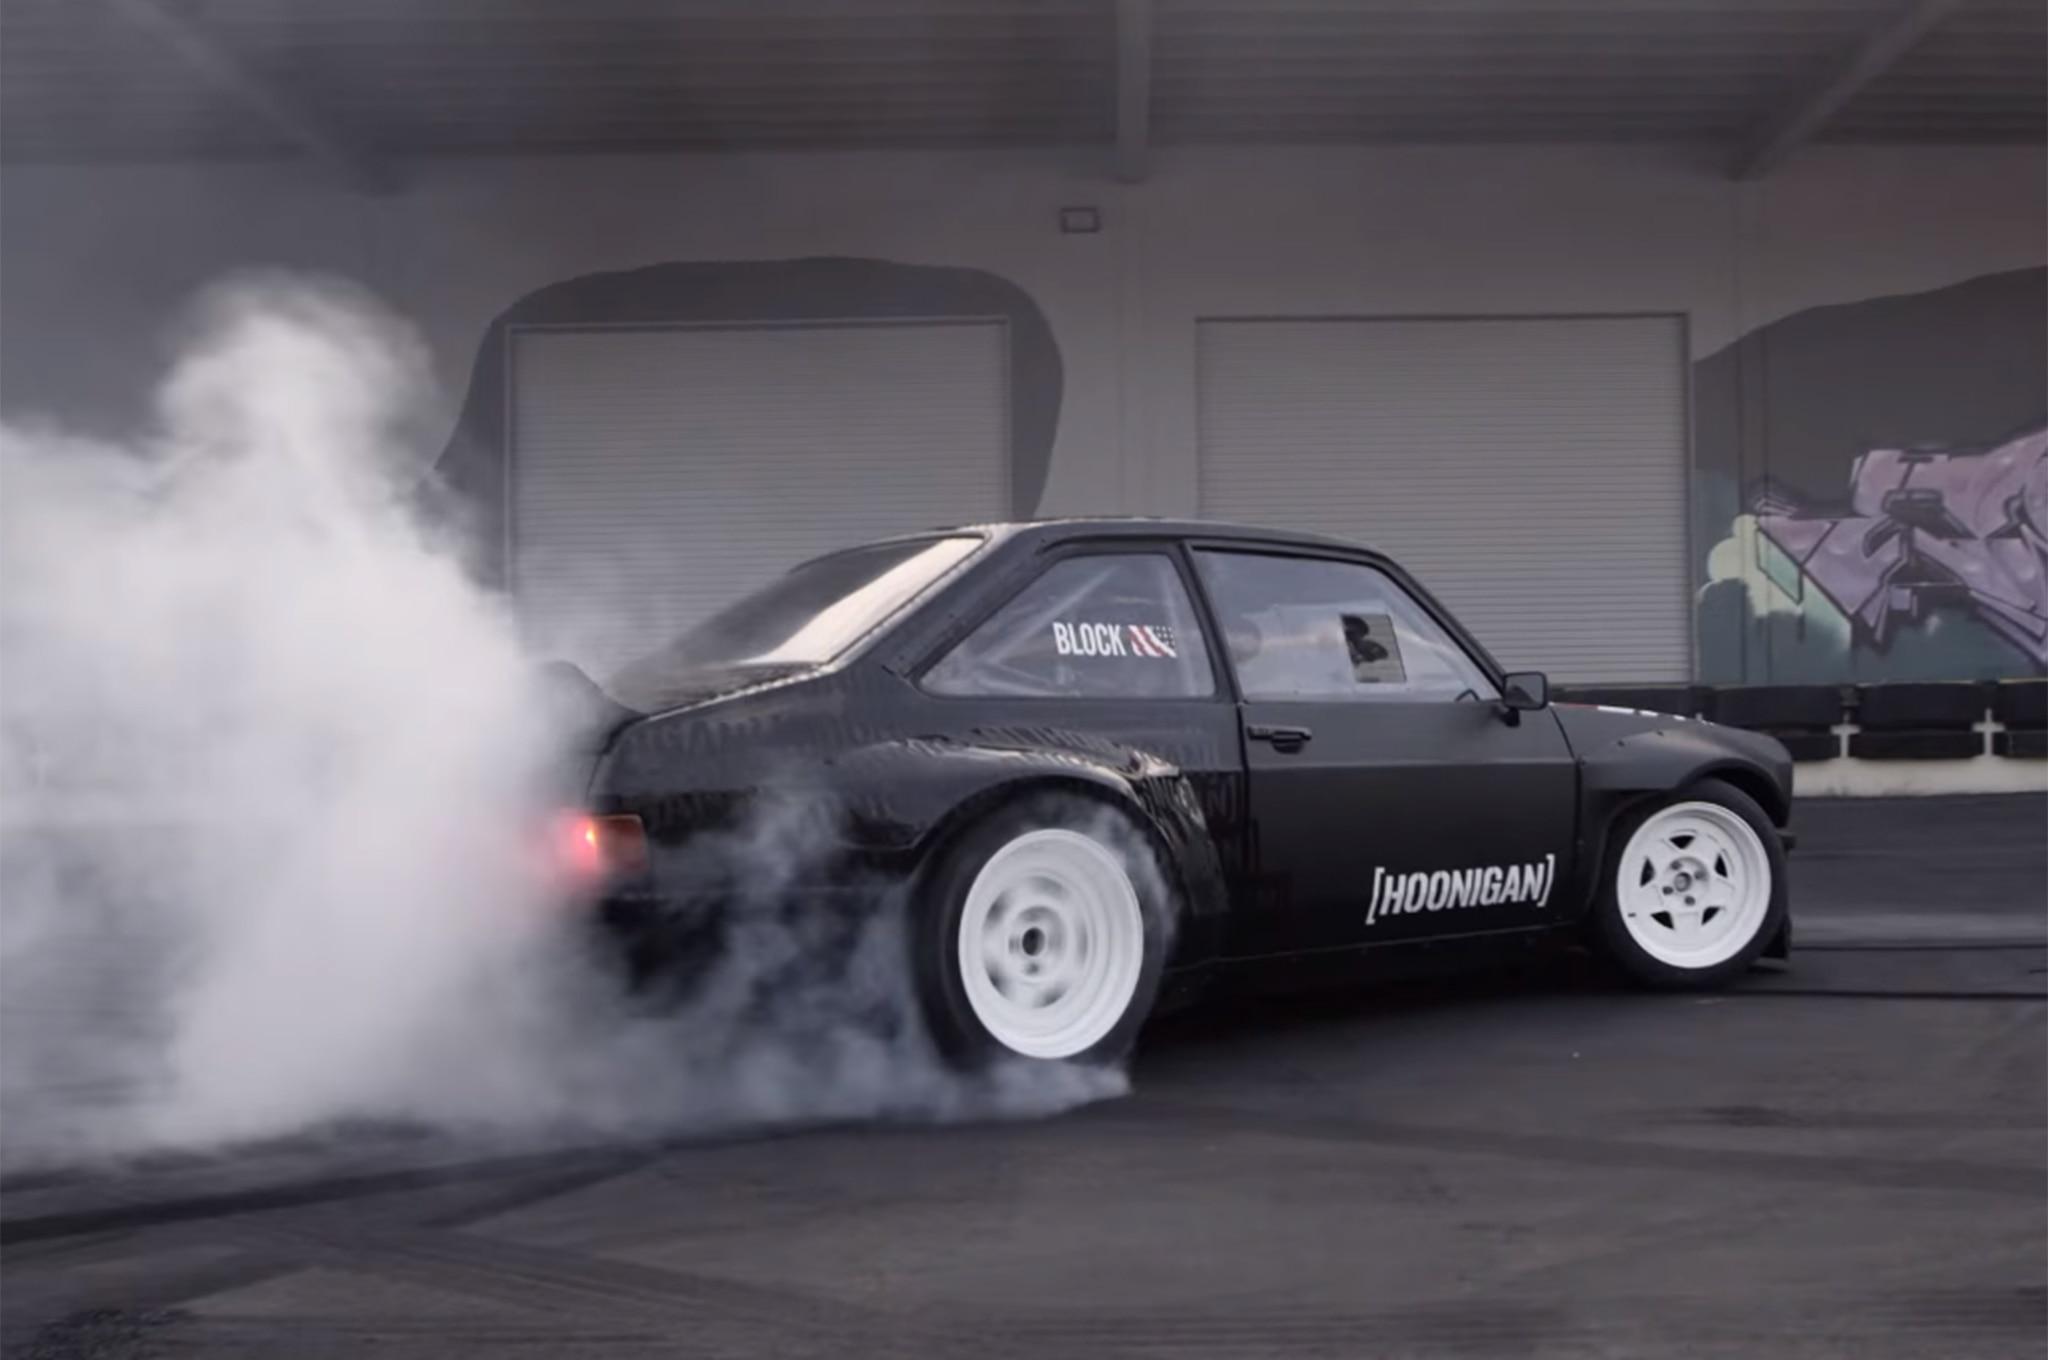 Tire noise in escort